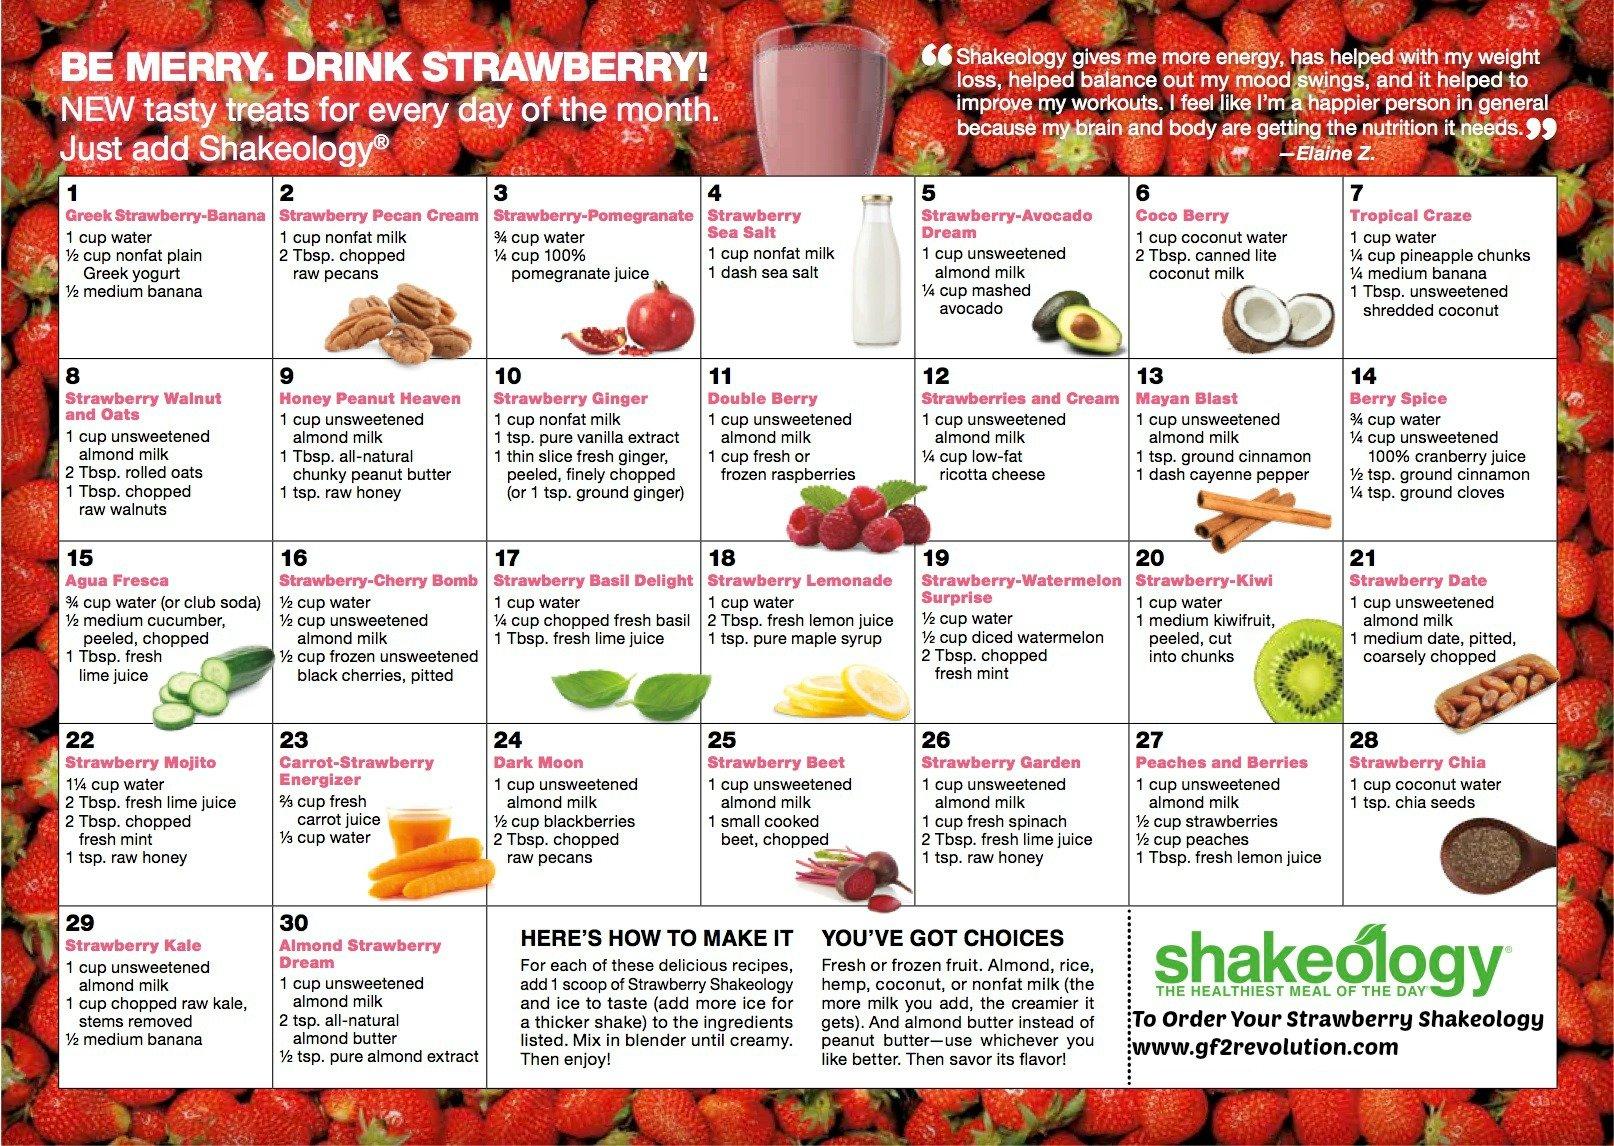 Strawberry Shakeology Recipe Calendar | Gf2 Revolution Hip Hop Abs Schedule Printable